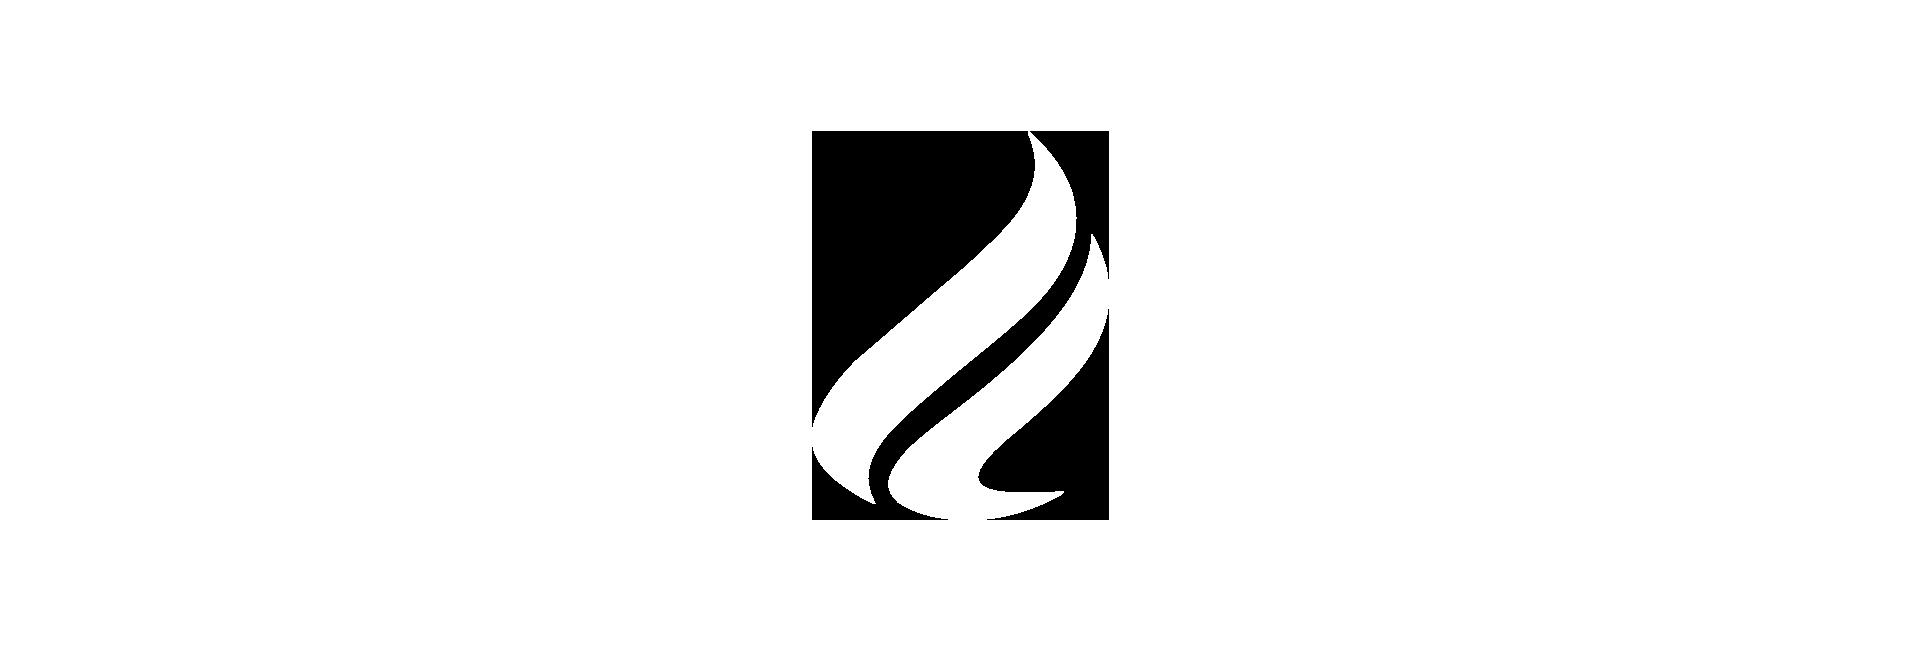 backgrounds-logo